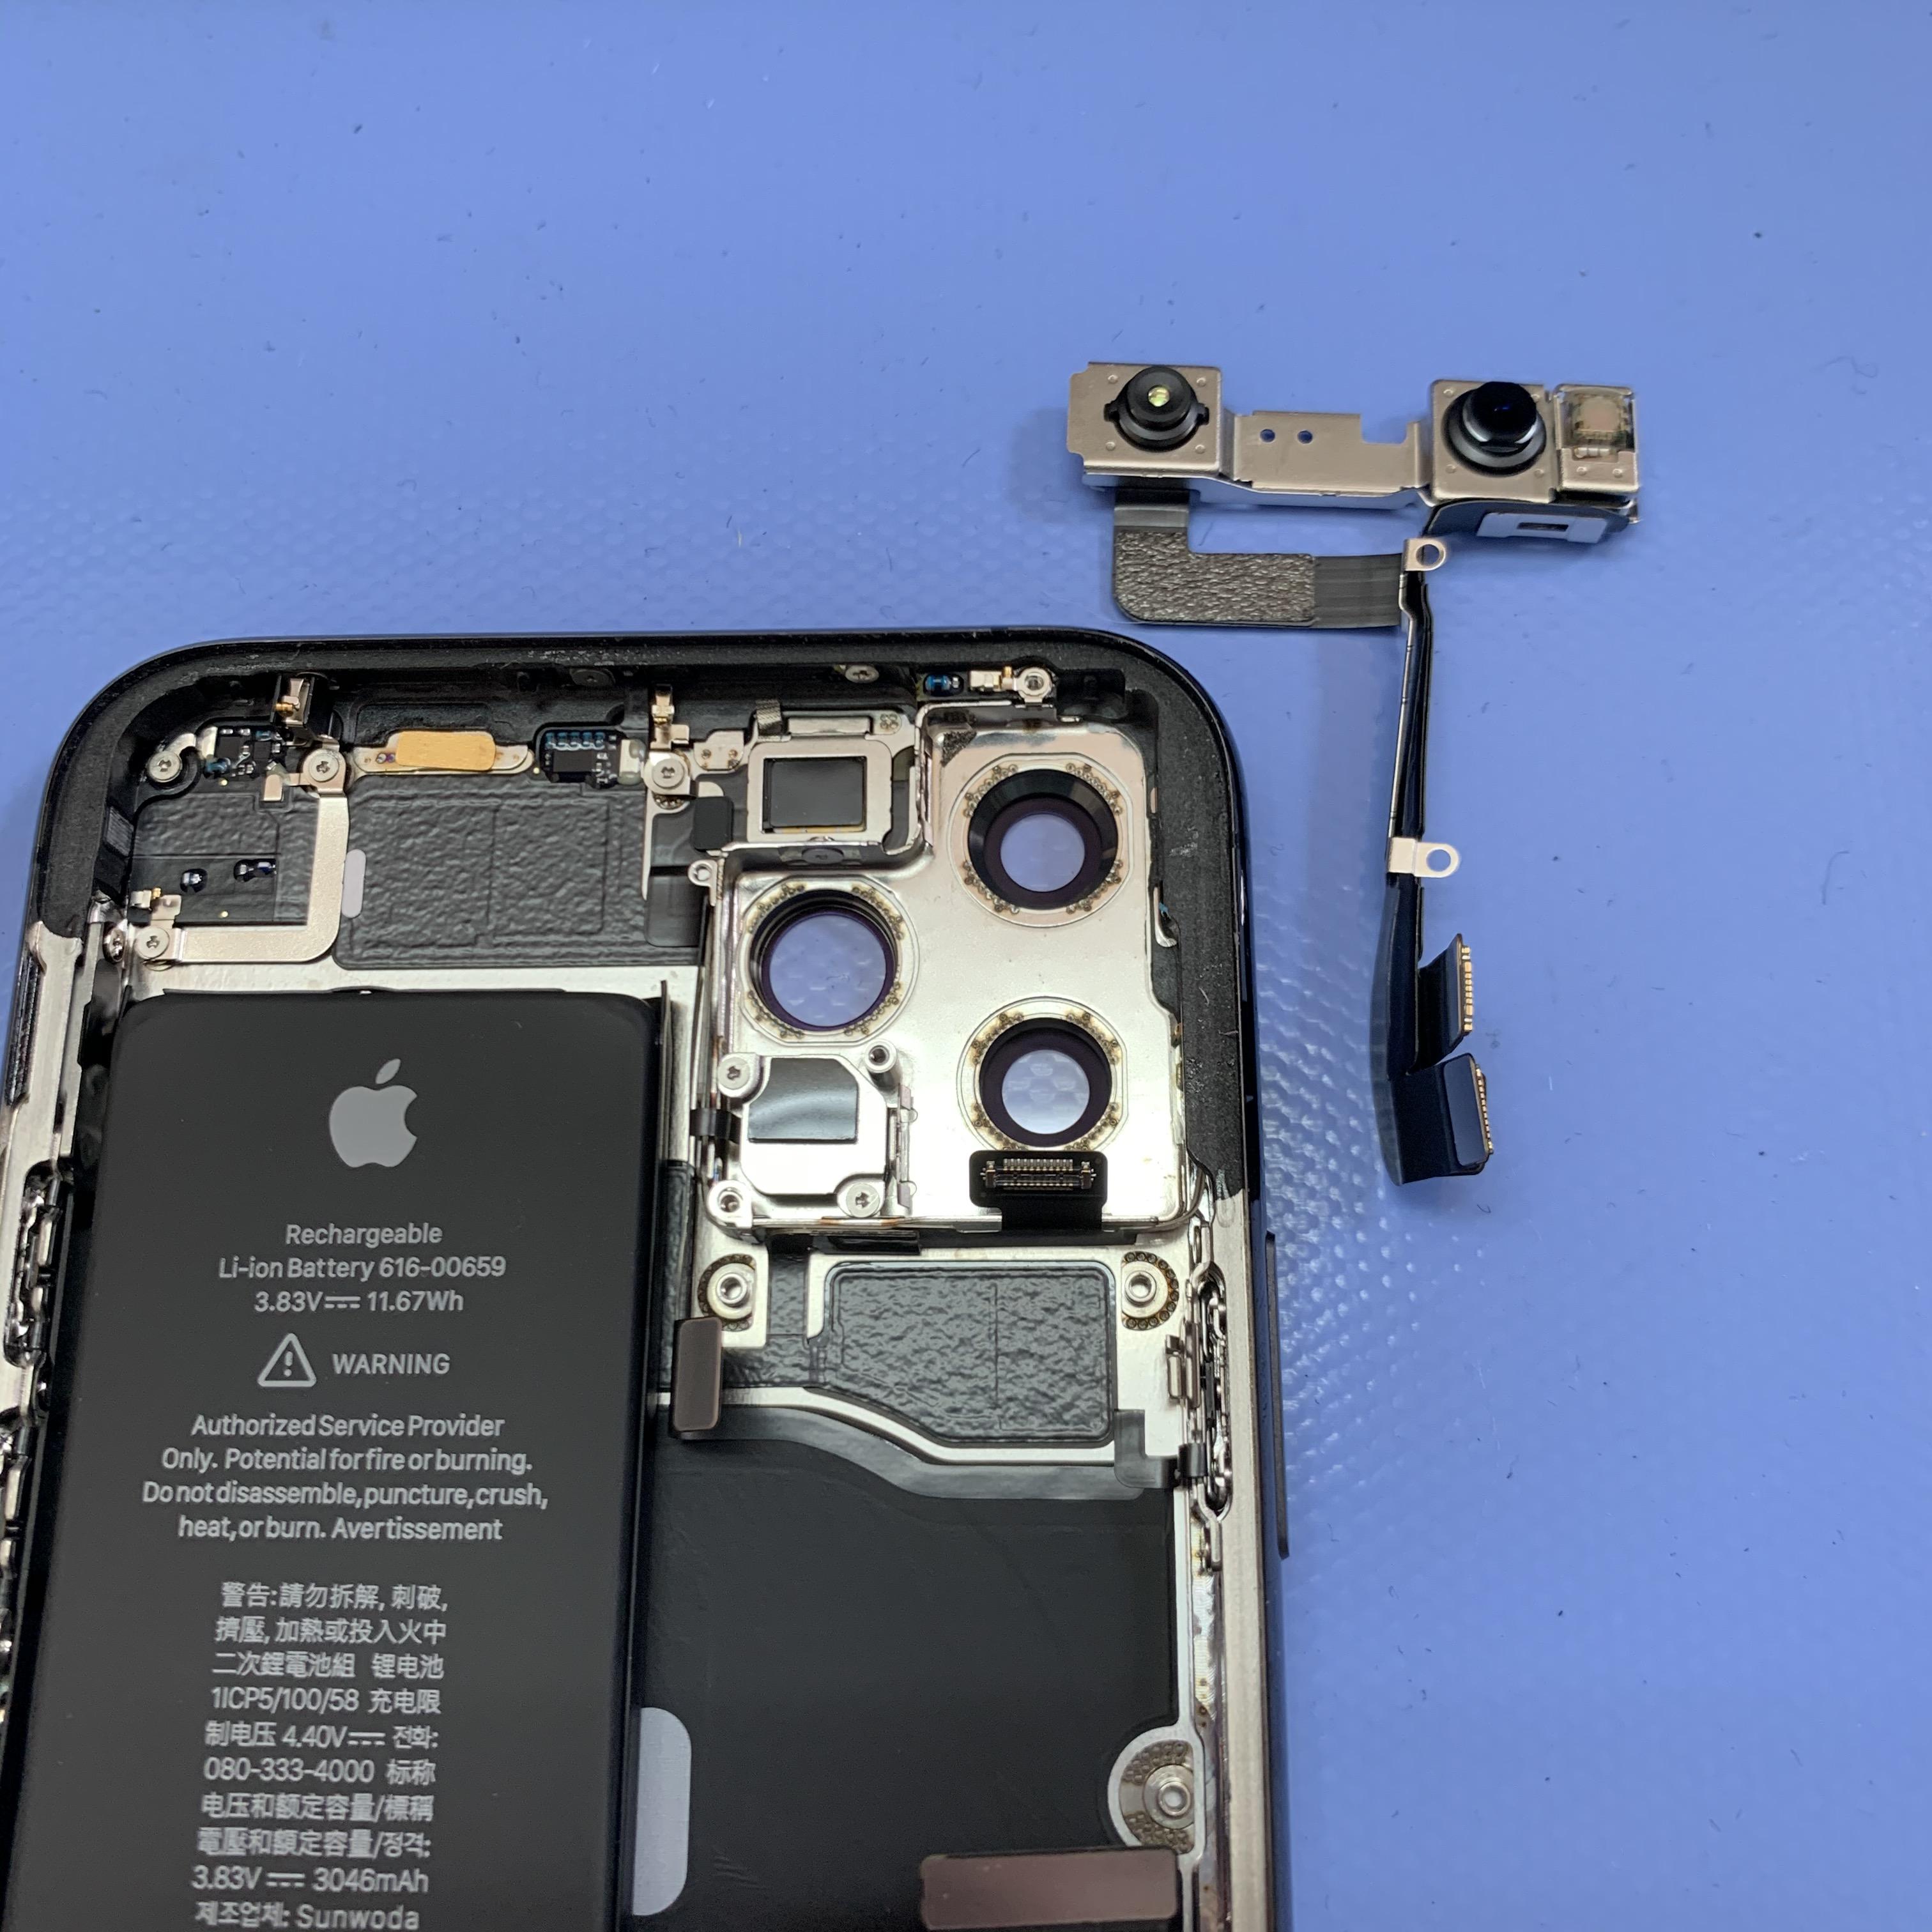 iPhone11Proのインカメラパーツを外す